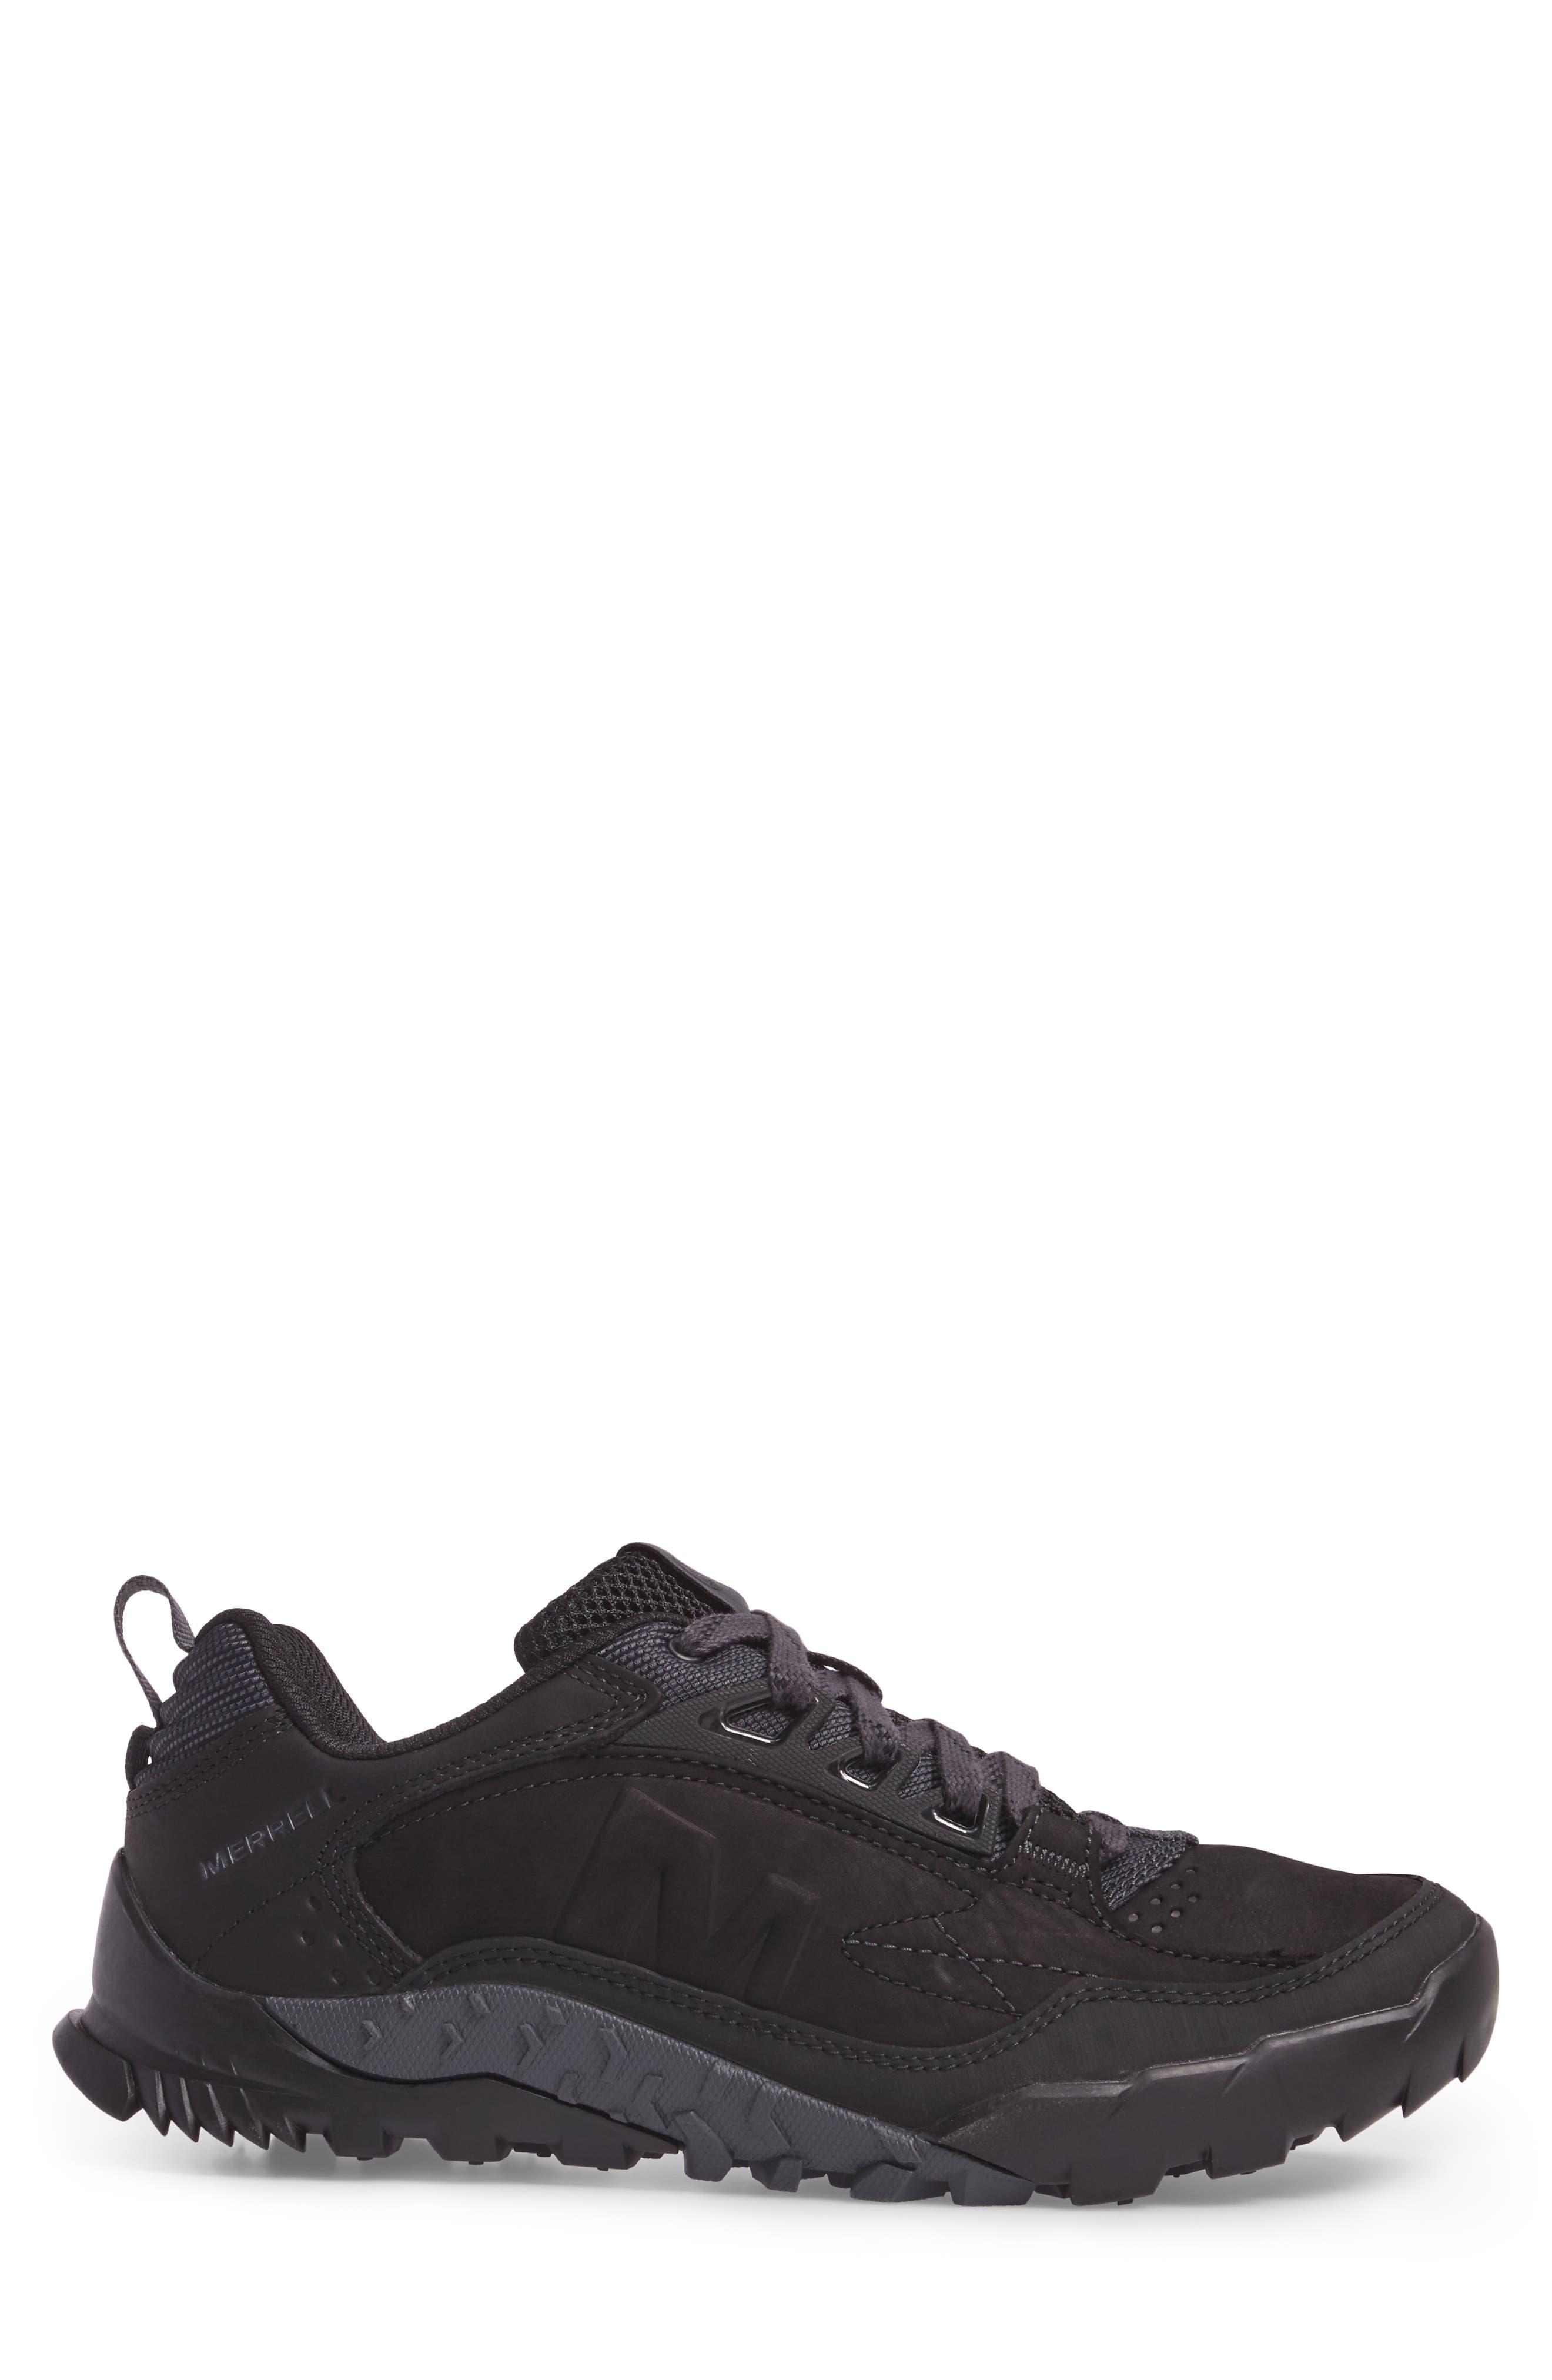 Annex Tak Low Hiking Shoe,                             Alternate thumbnail 3, color,                             Black Nubuck Leather